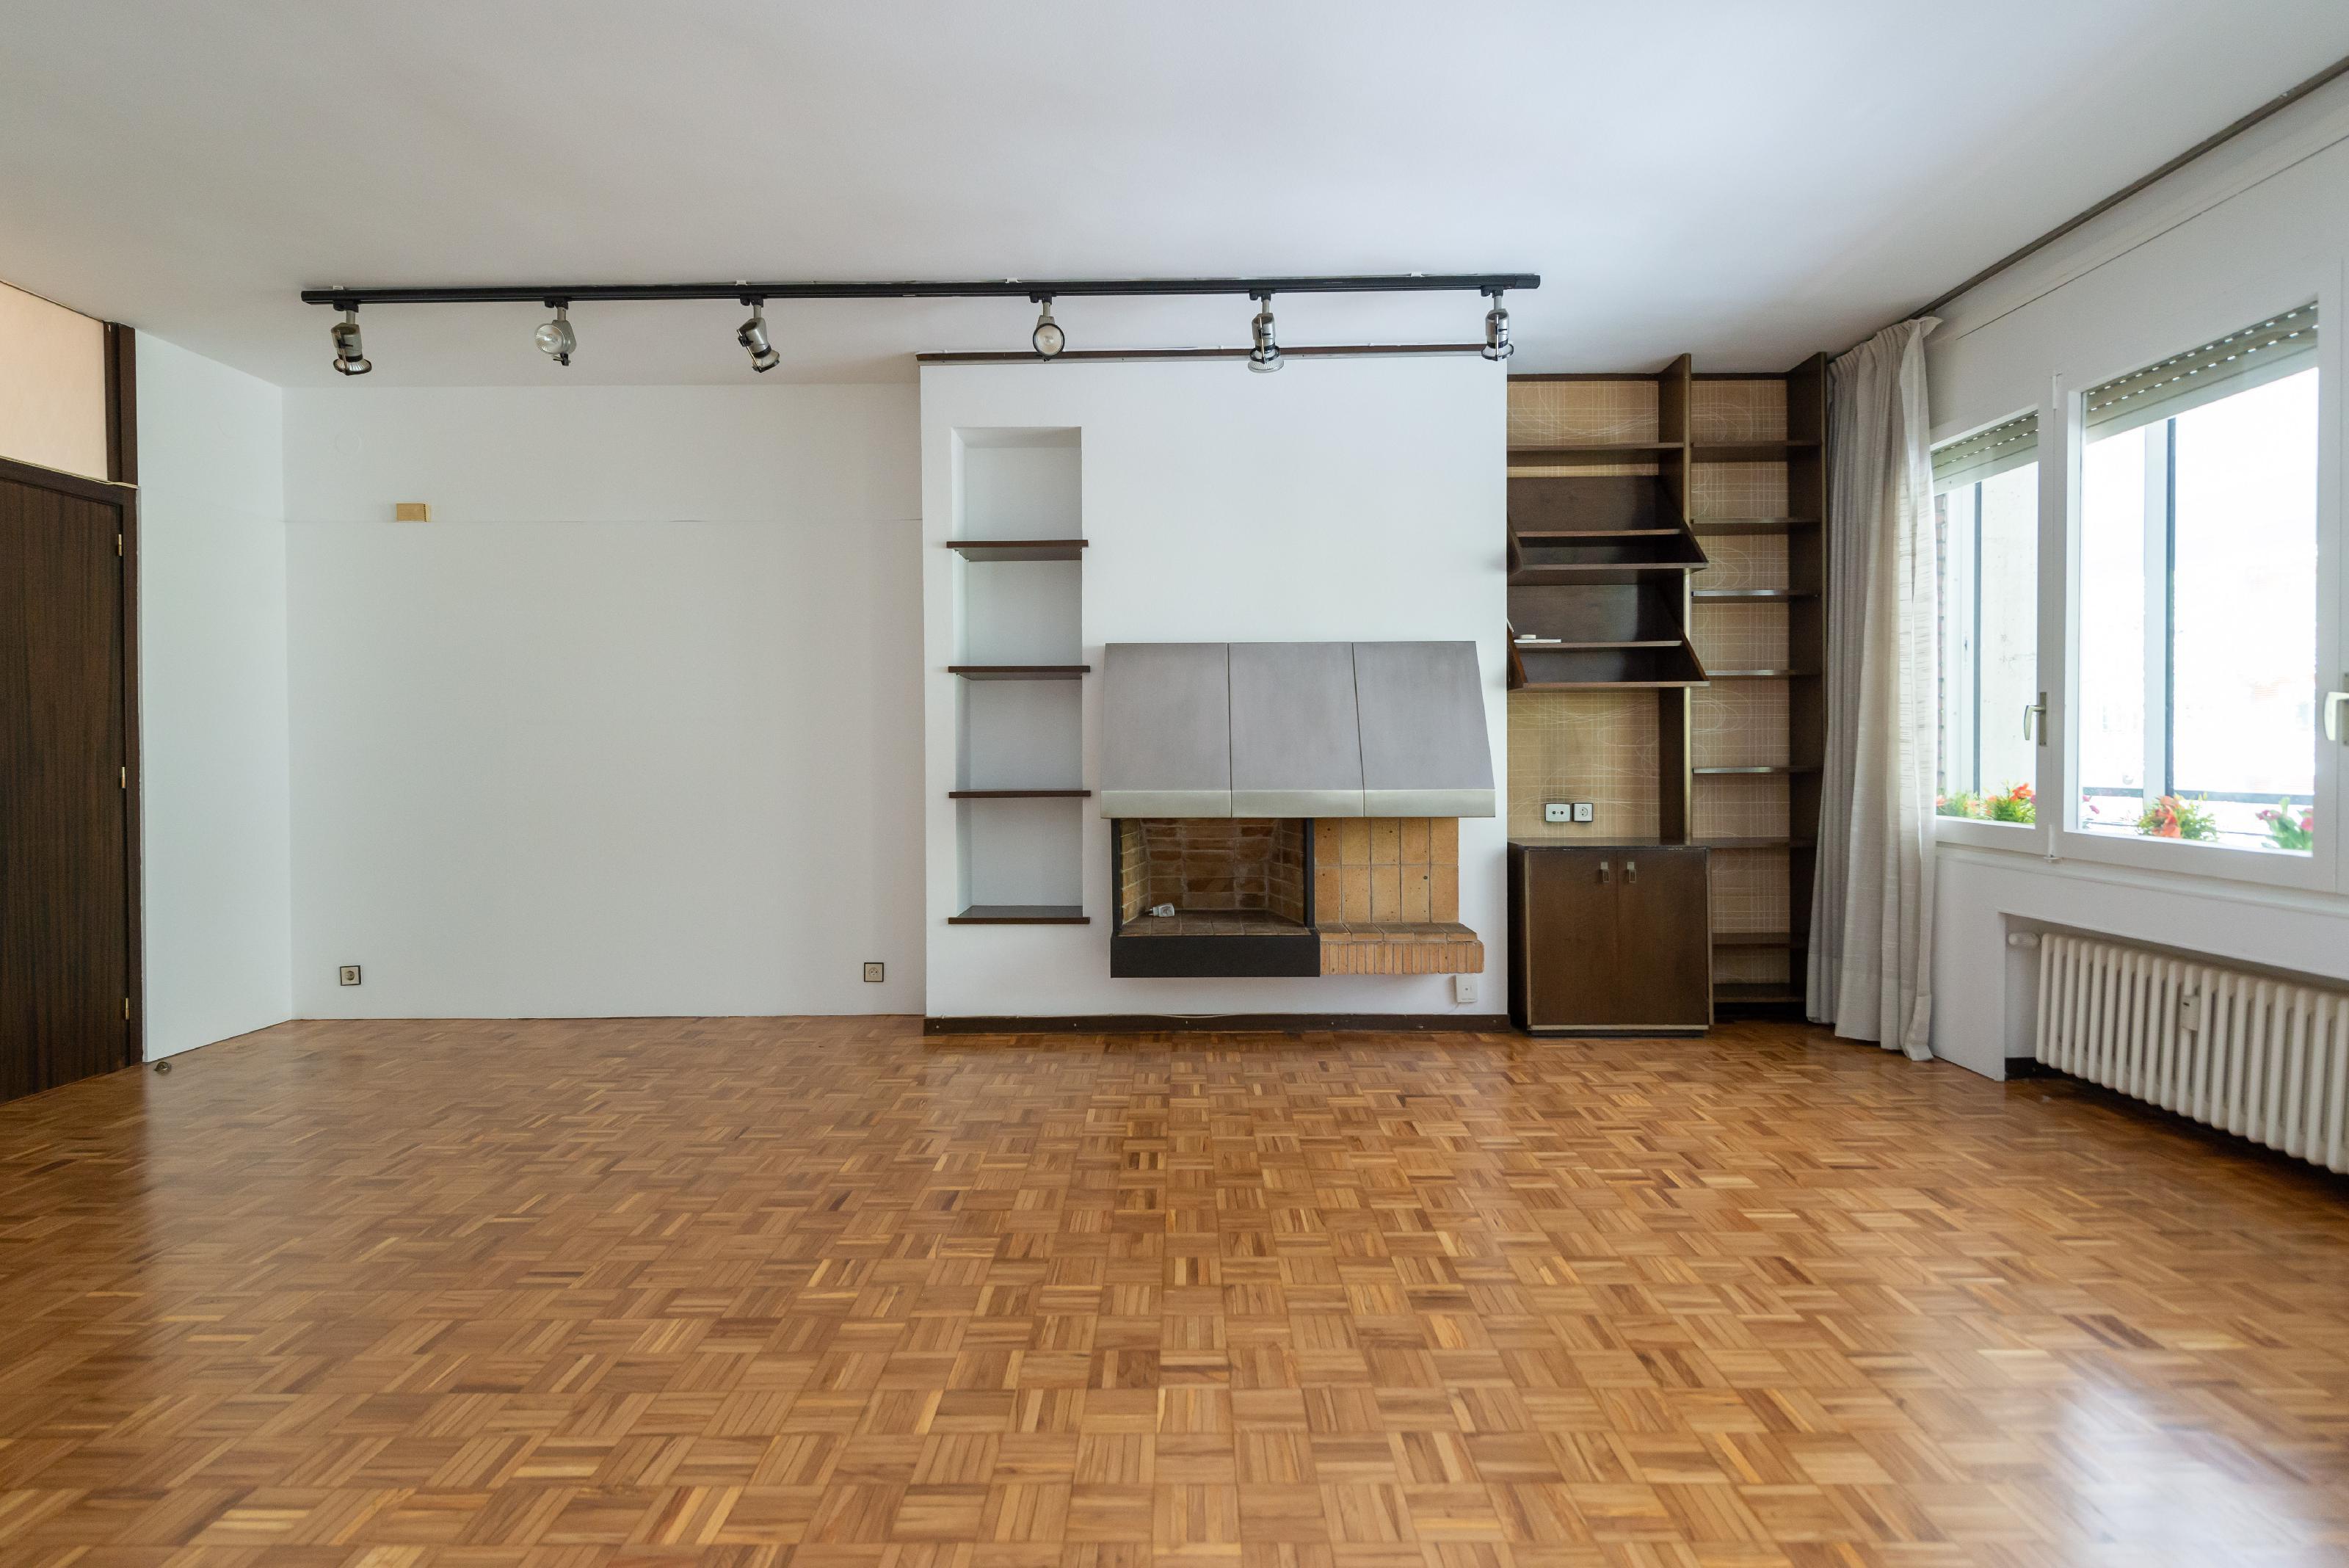 253470 Flat for sale in Sarrià-Sant Gervasi, El Putxet and Farró 12